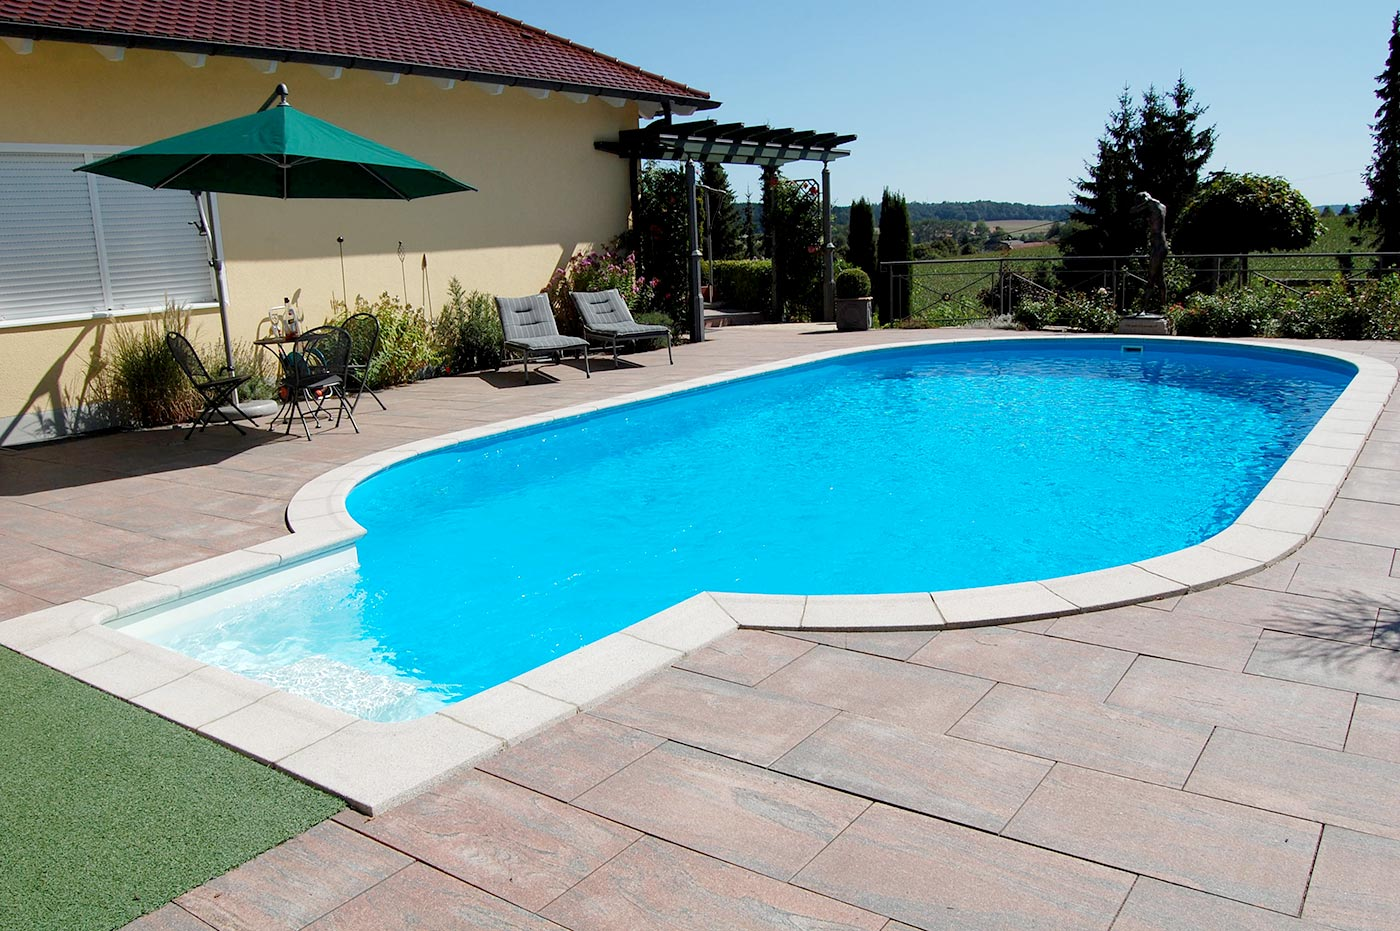 Emejing pool fur garten oval pictures house design ideas for Aufbauanleitung pool stahlwand